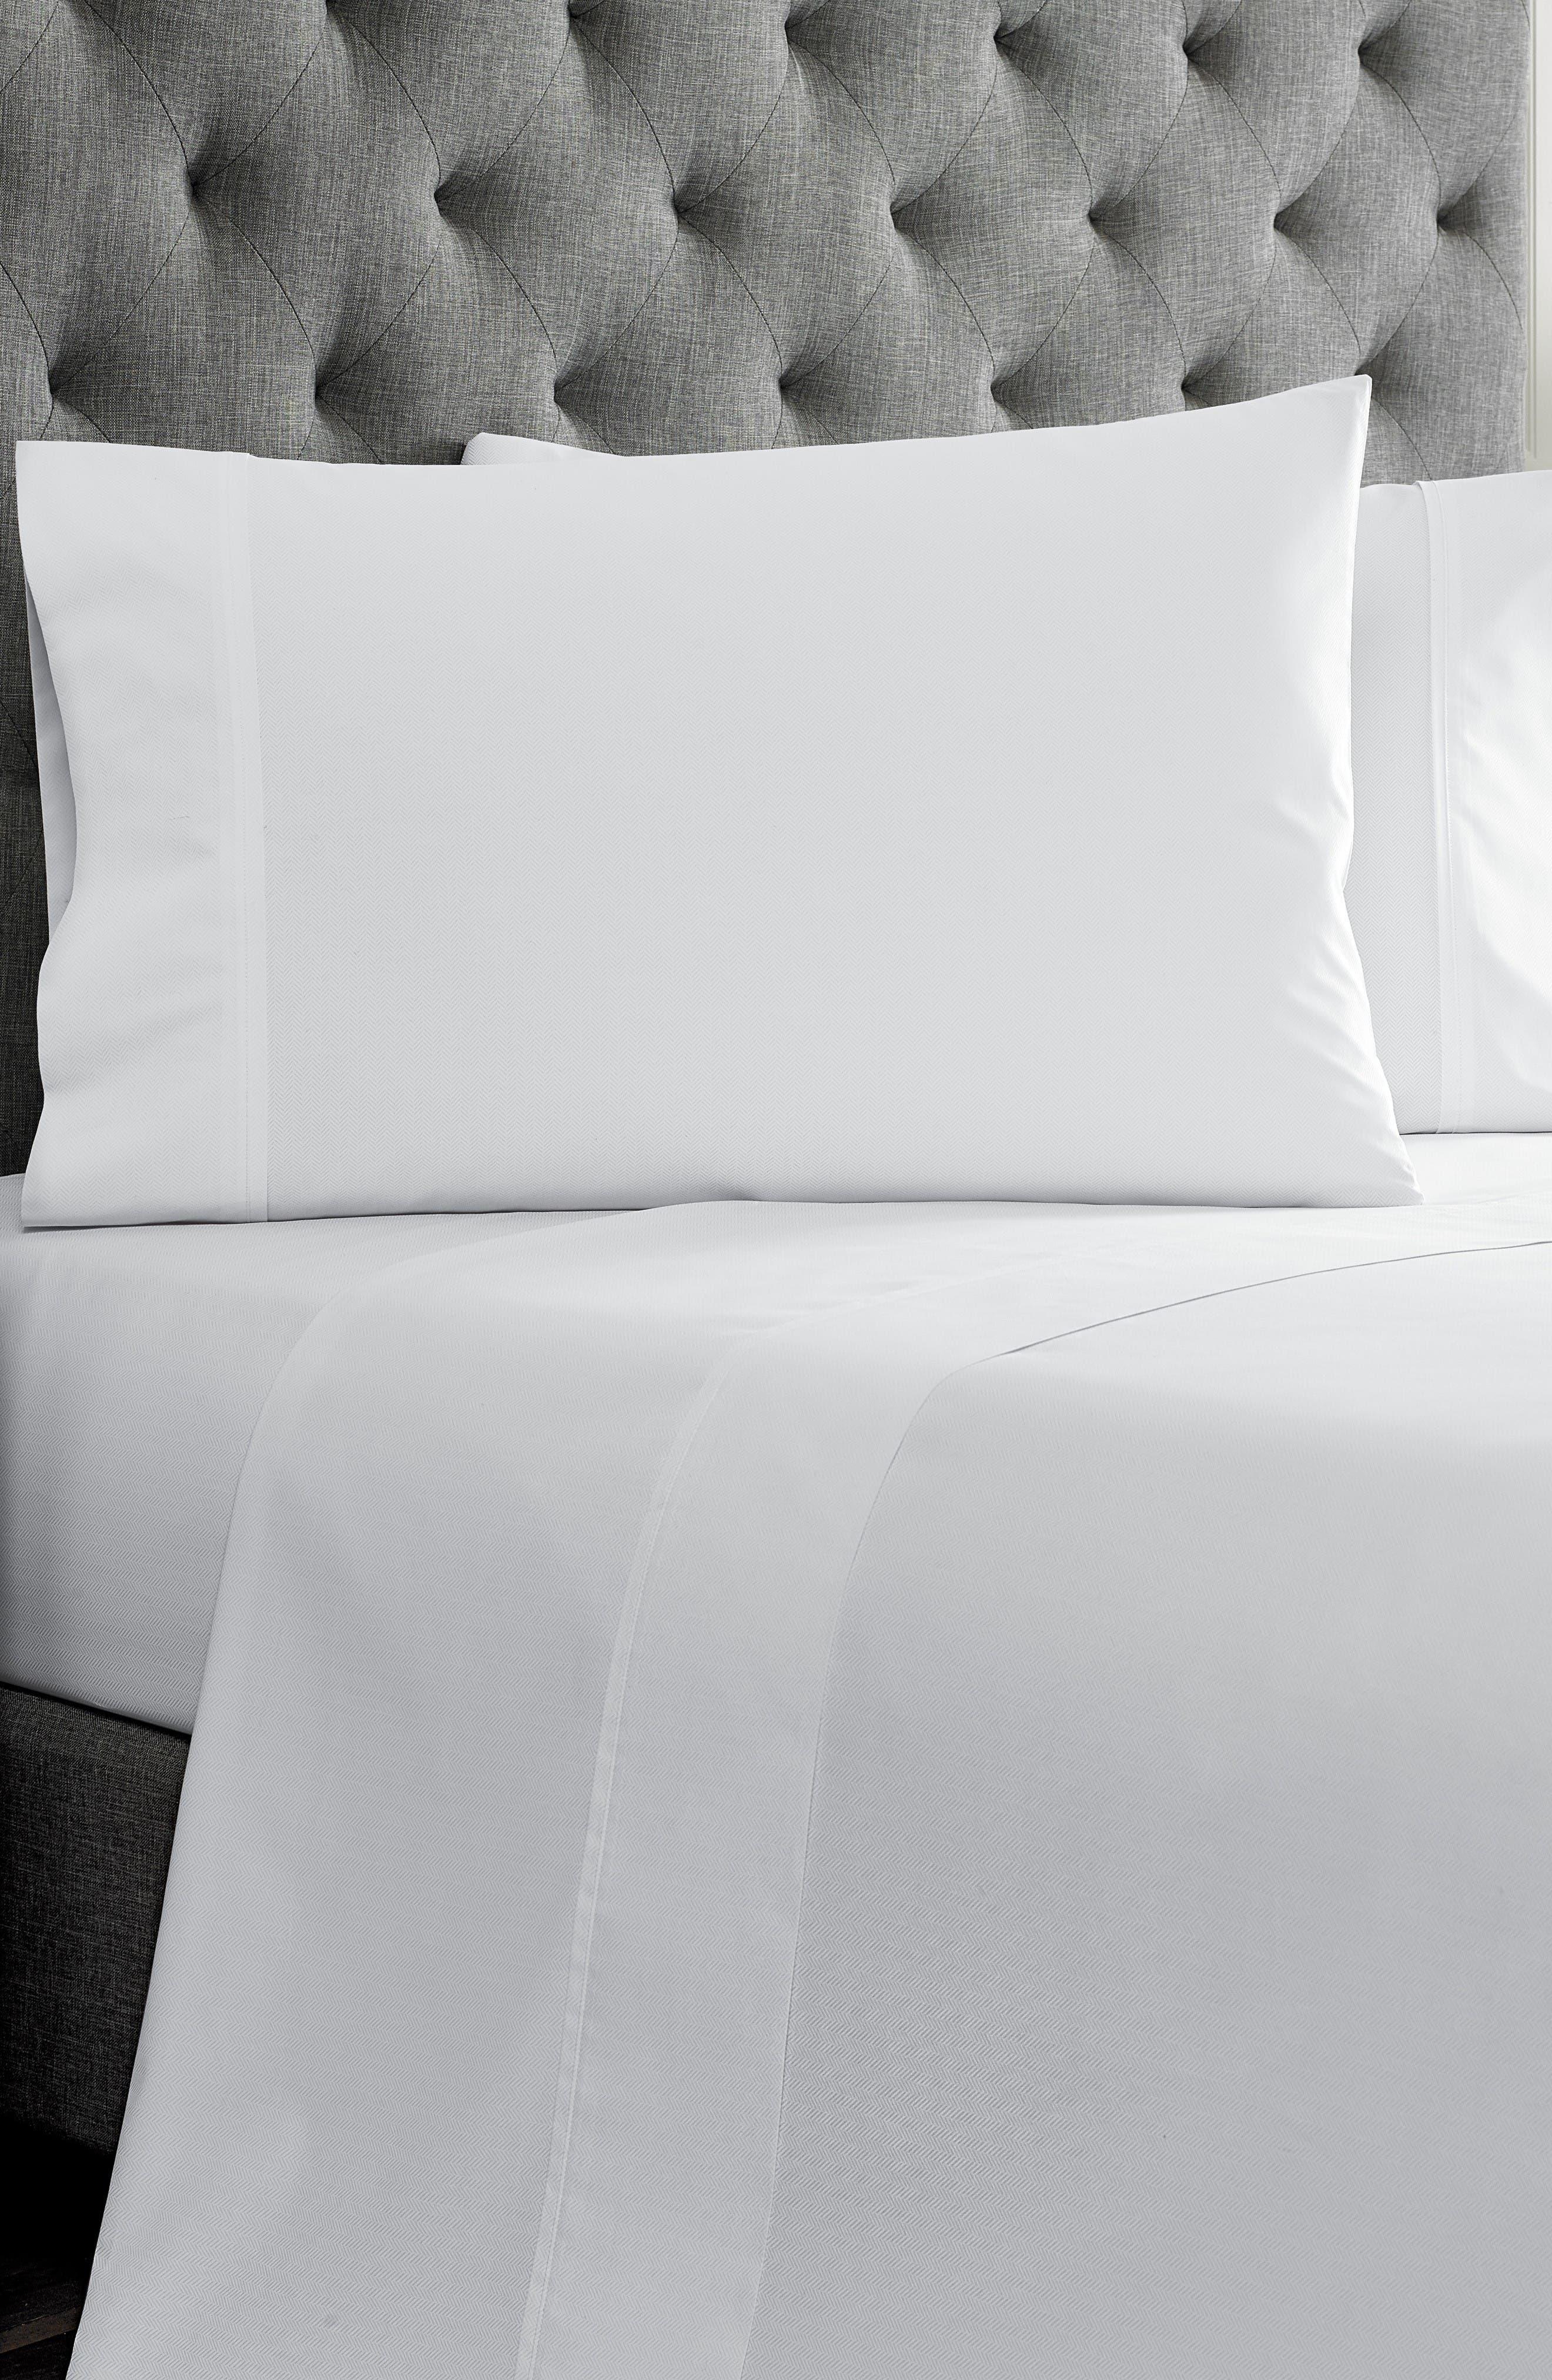 Main Image - Tommy Hilfiger Robinson Herringbone Pillowcases